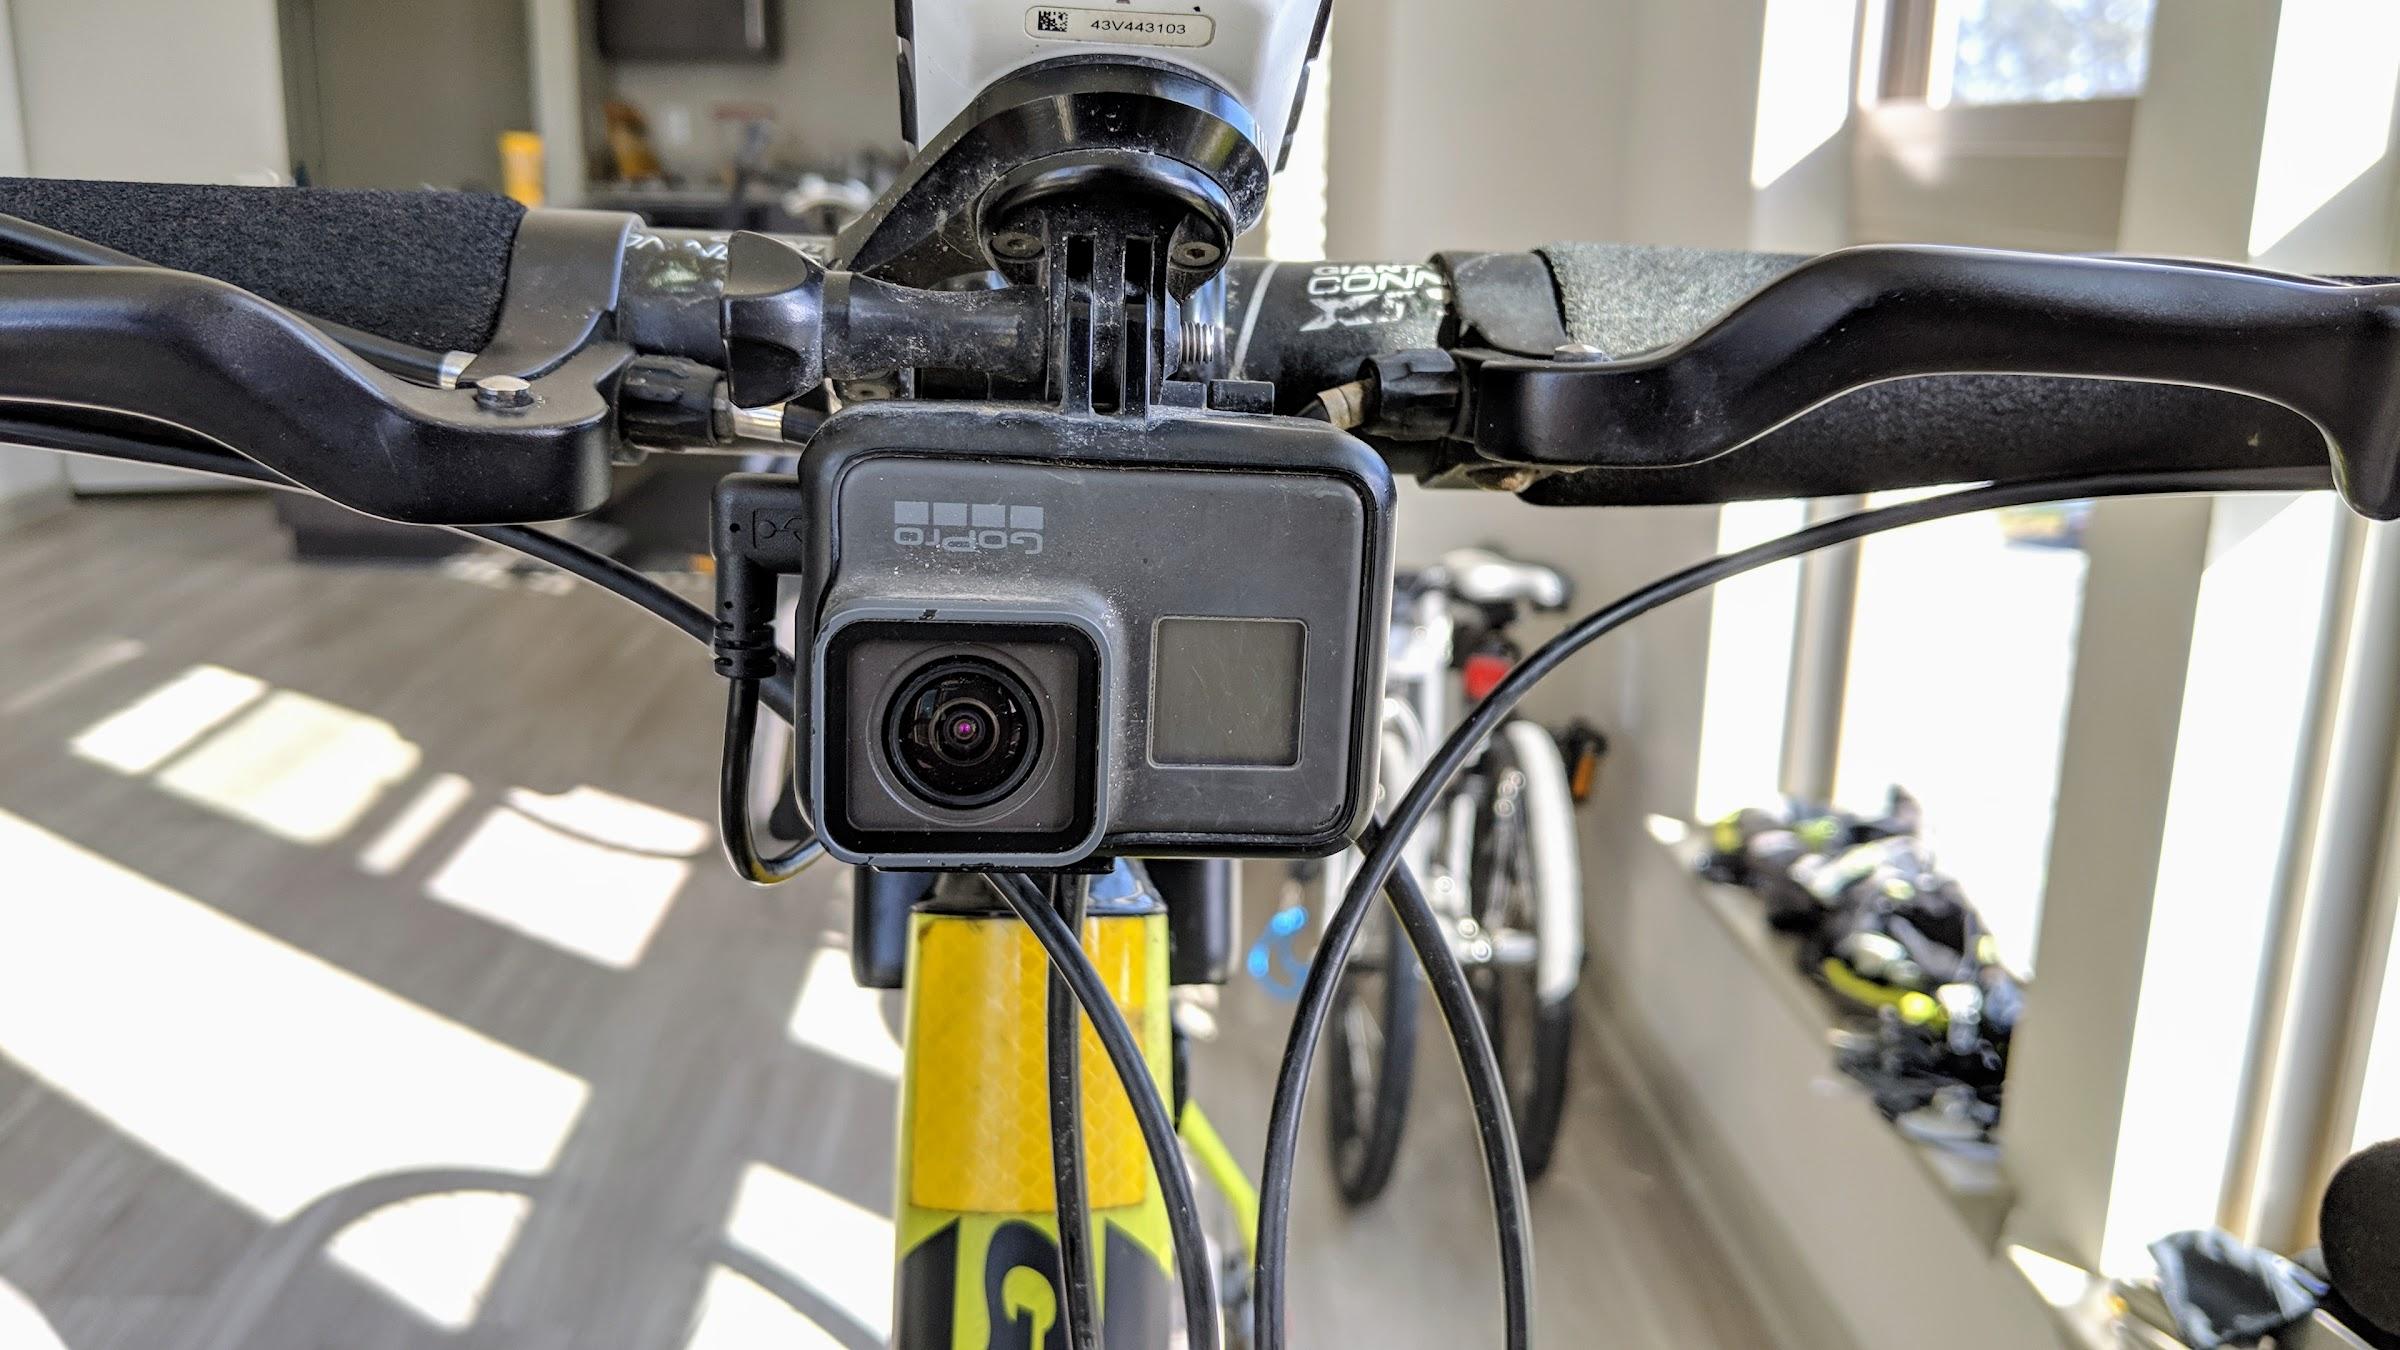 GoPro camera mounted on bicycle